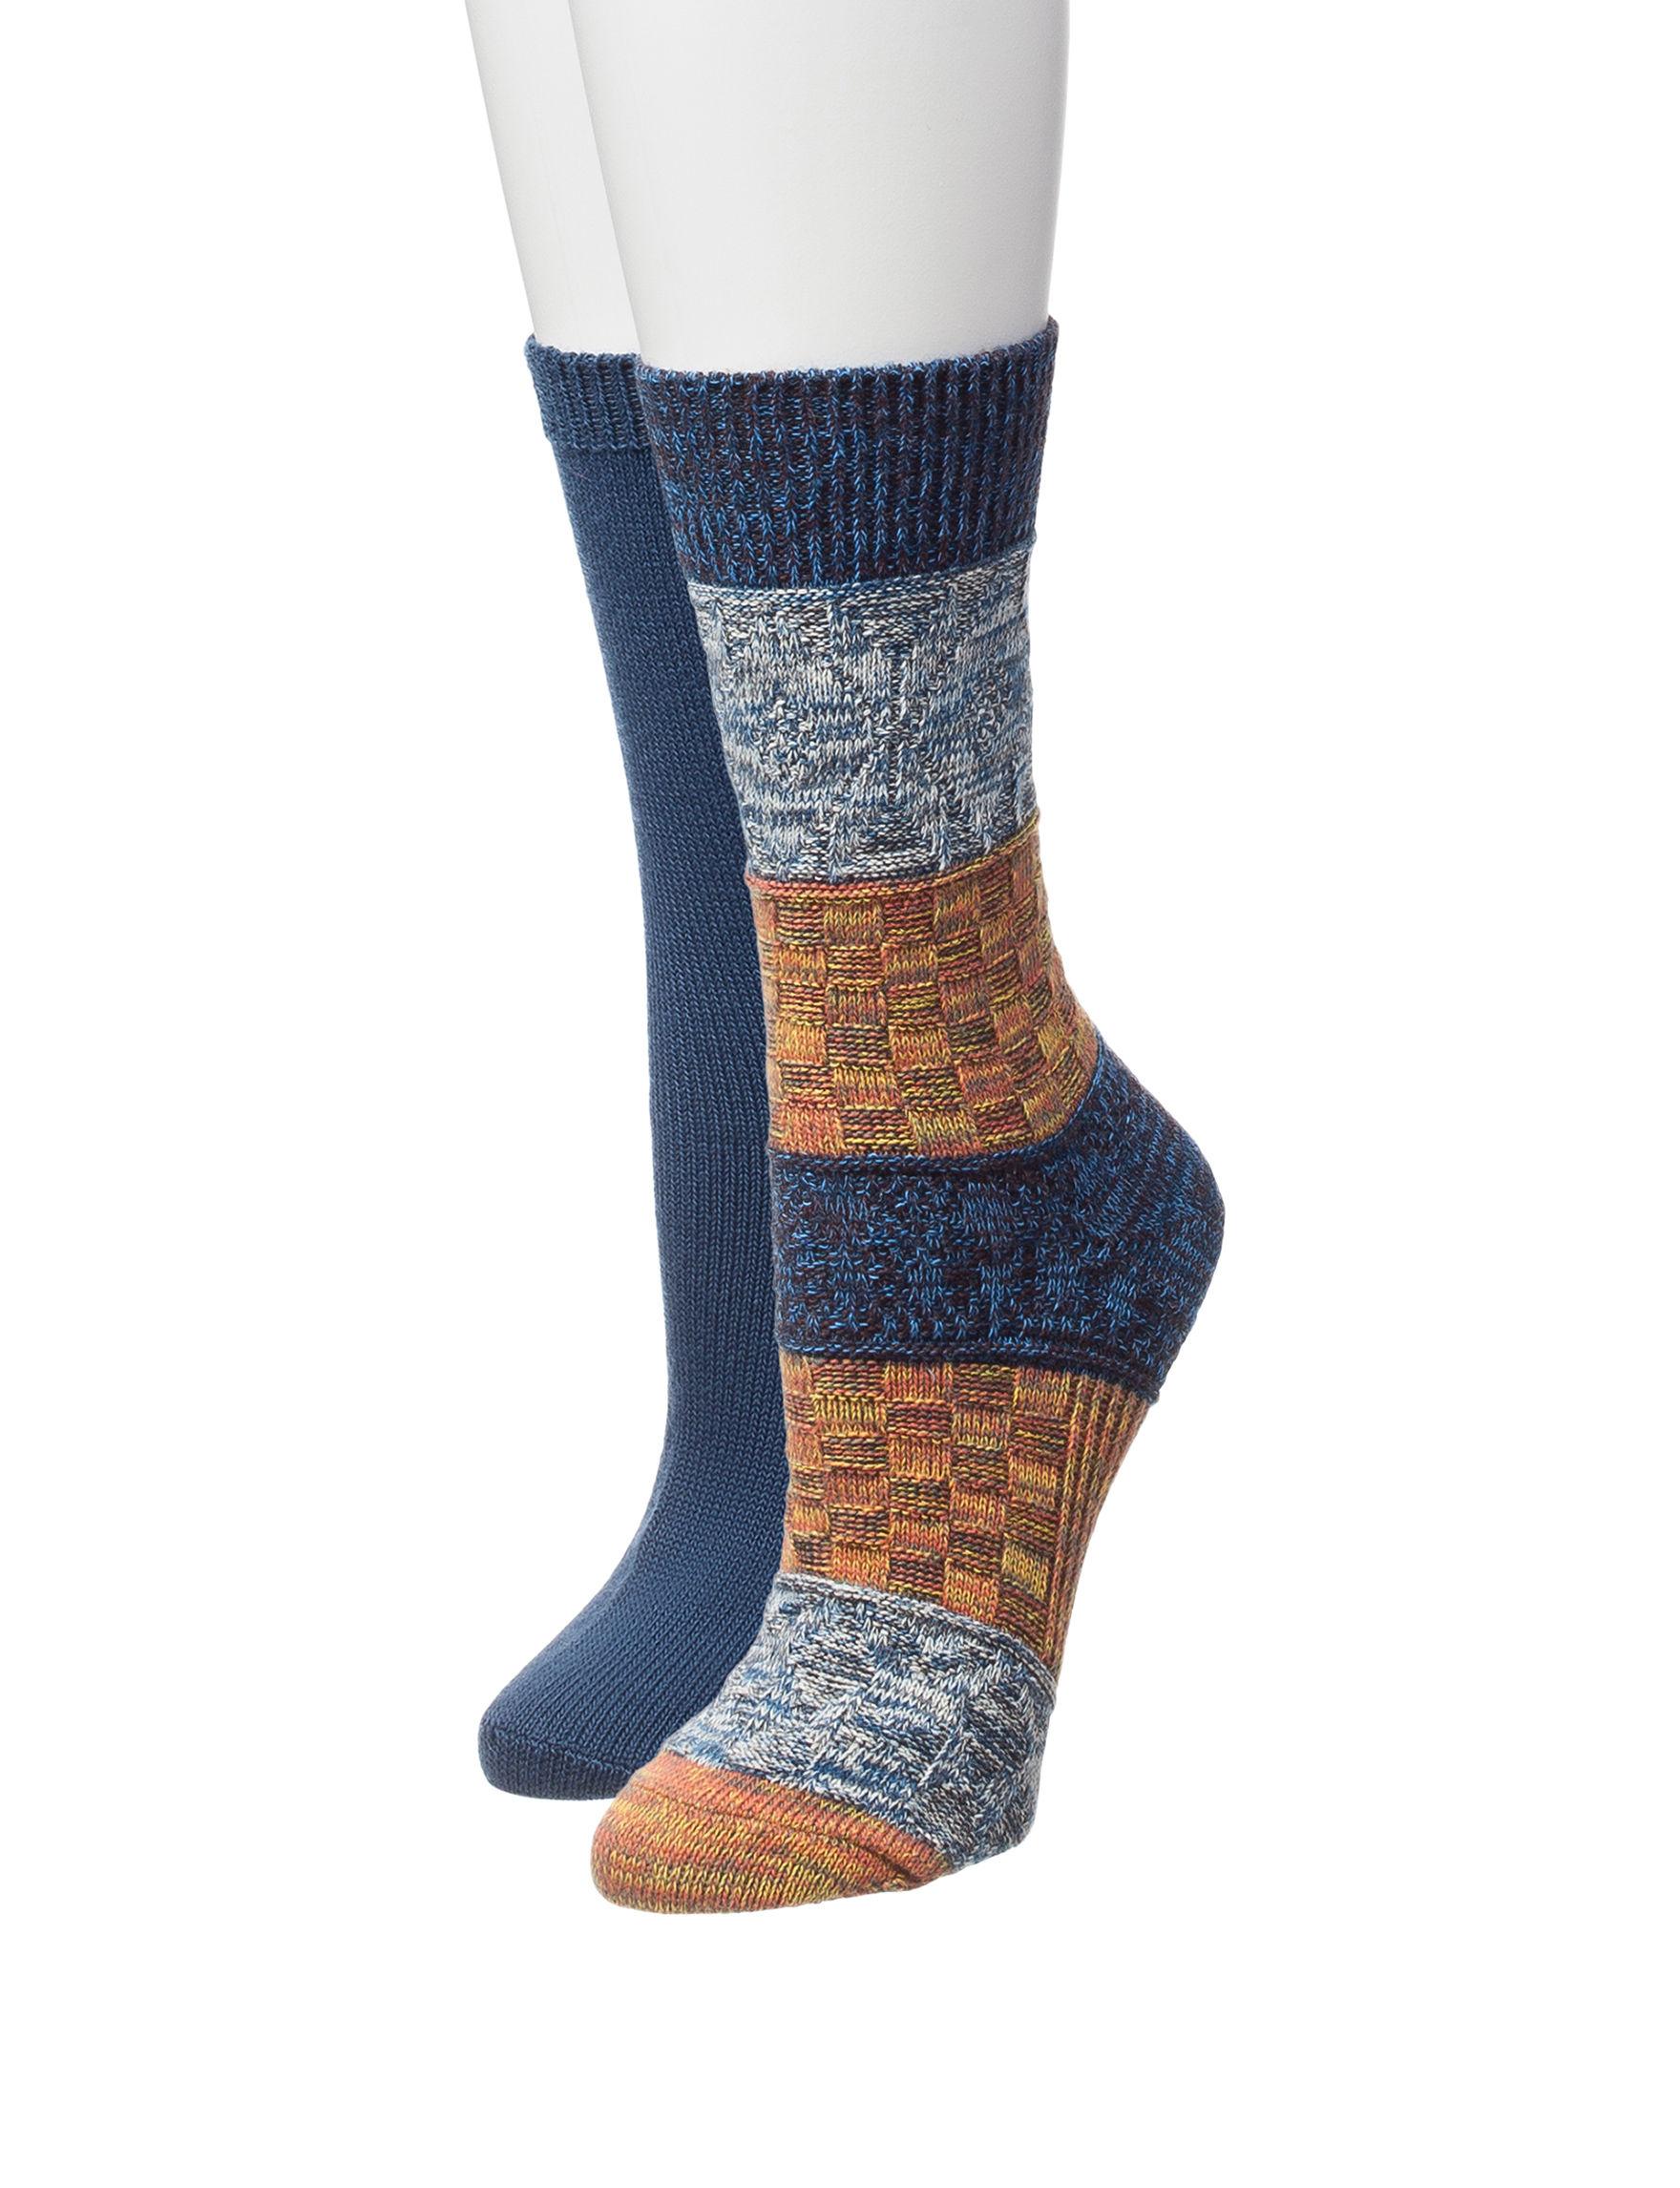 Signature Studio Blue Socks